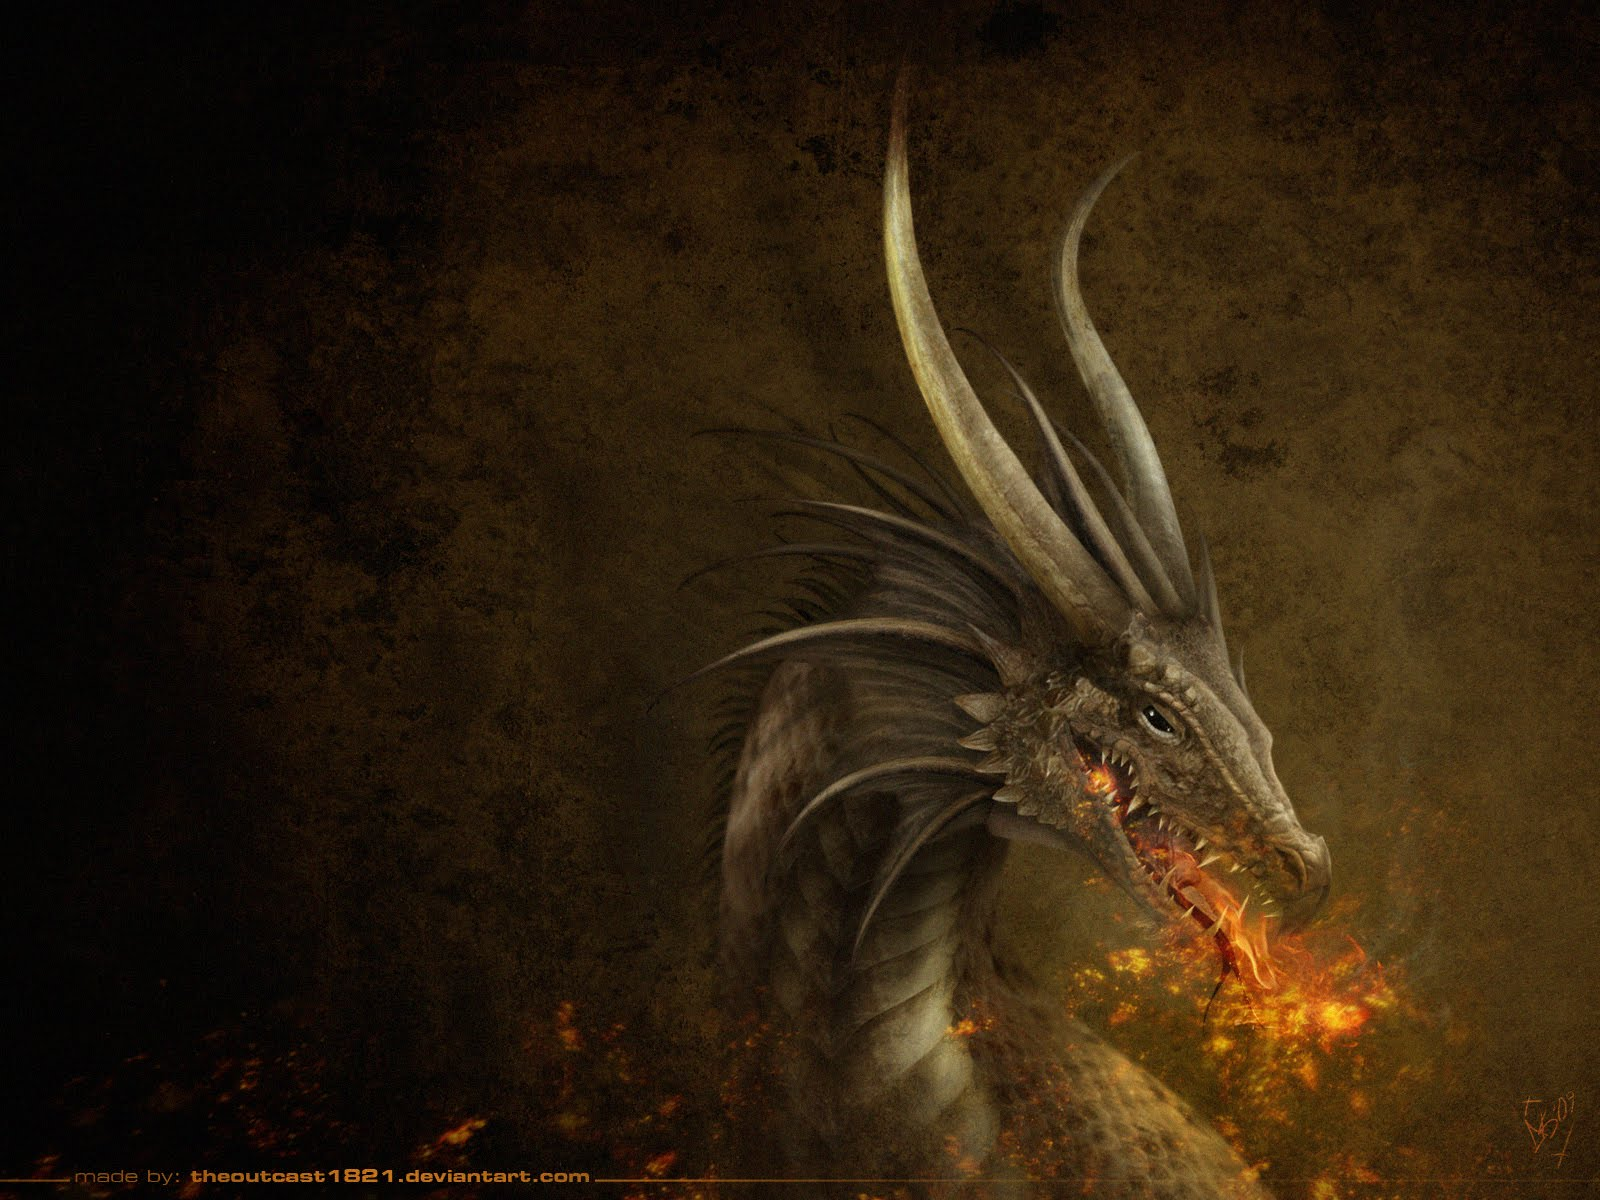 http://3.bp.blogspot.com/--h__NEjNYjs/TbXbossRDiI/AAAAAAAACss/j_v931U3hyI/s1600/The_Dragon_wallpaper_by_TheOutcast1821.jpg